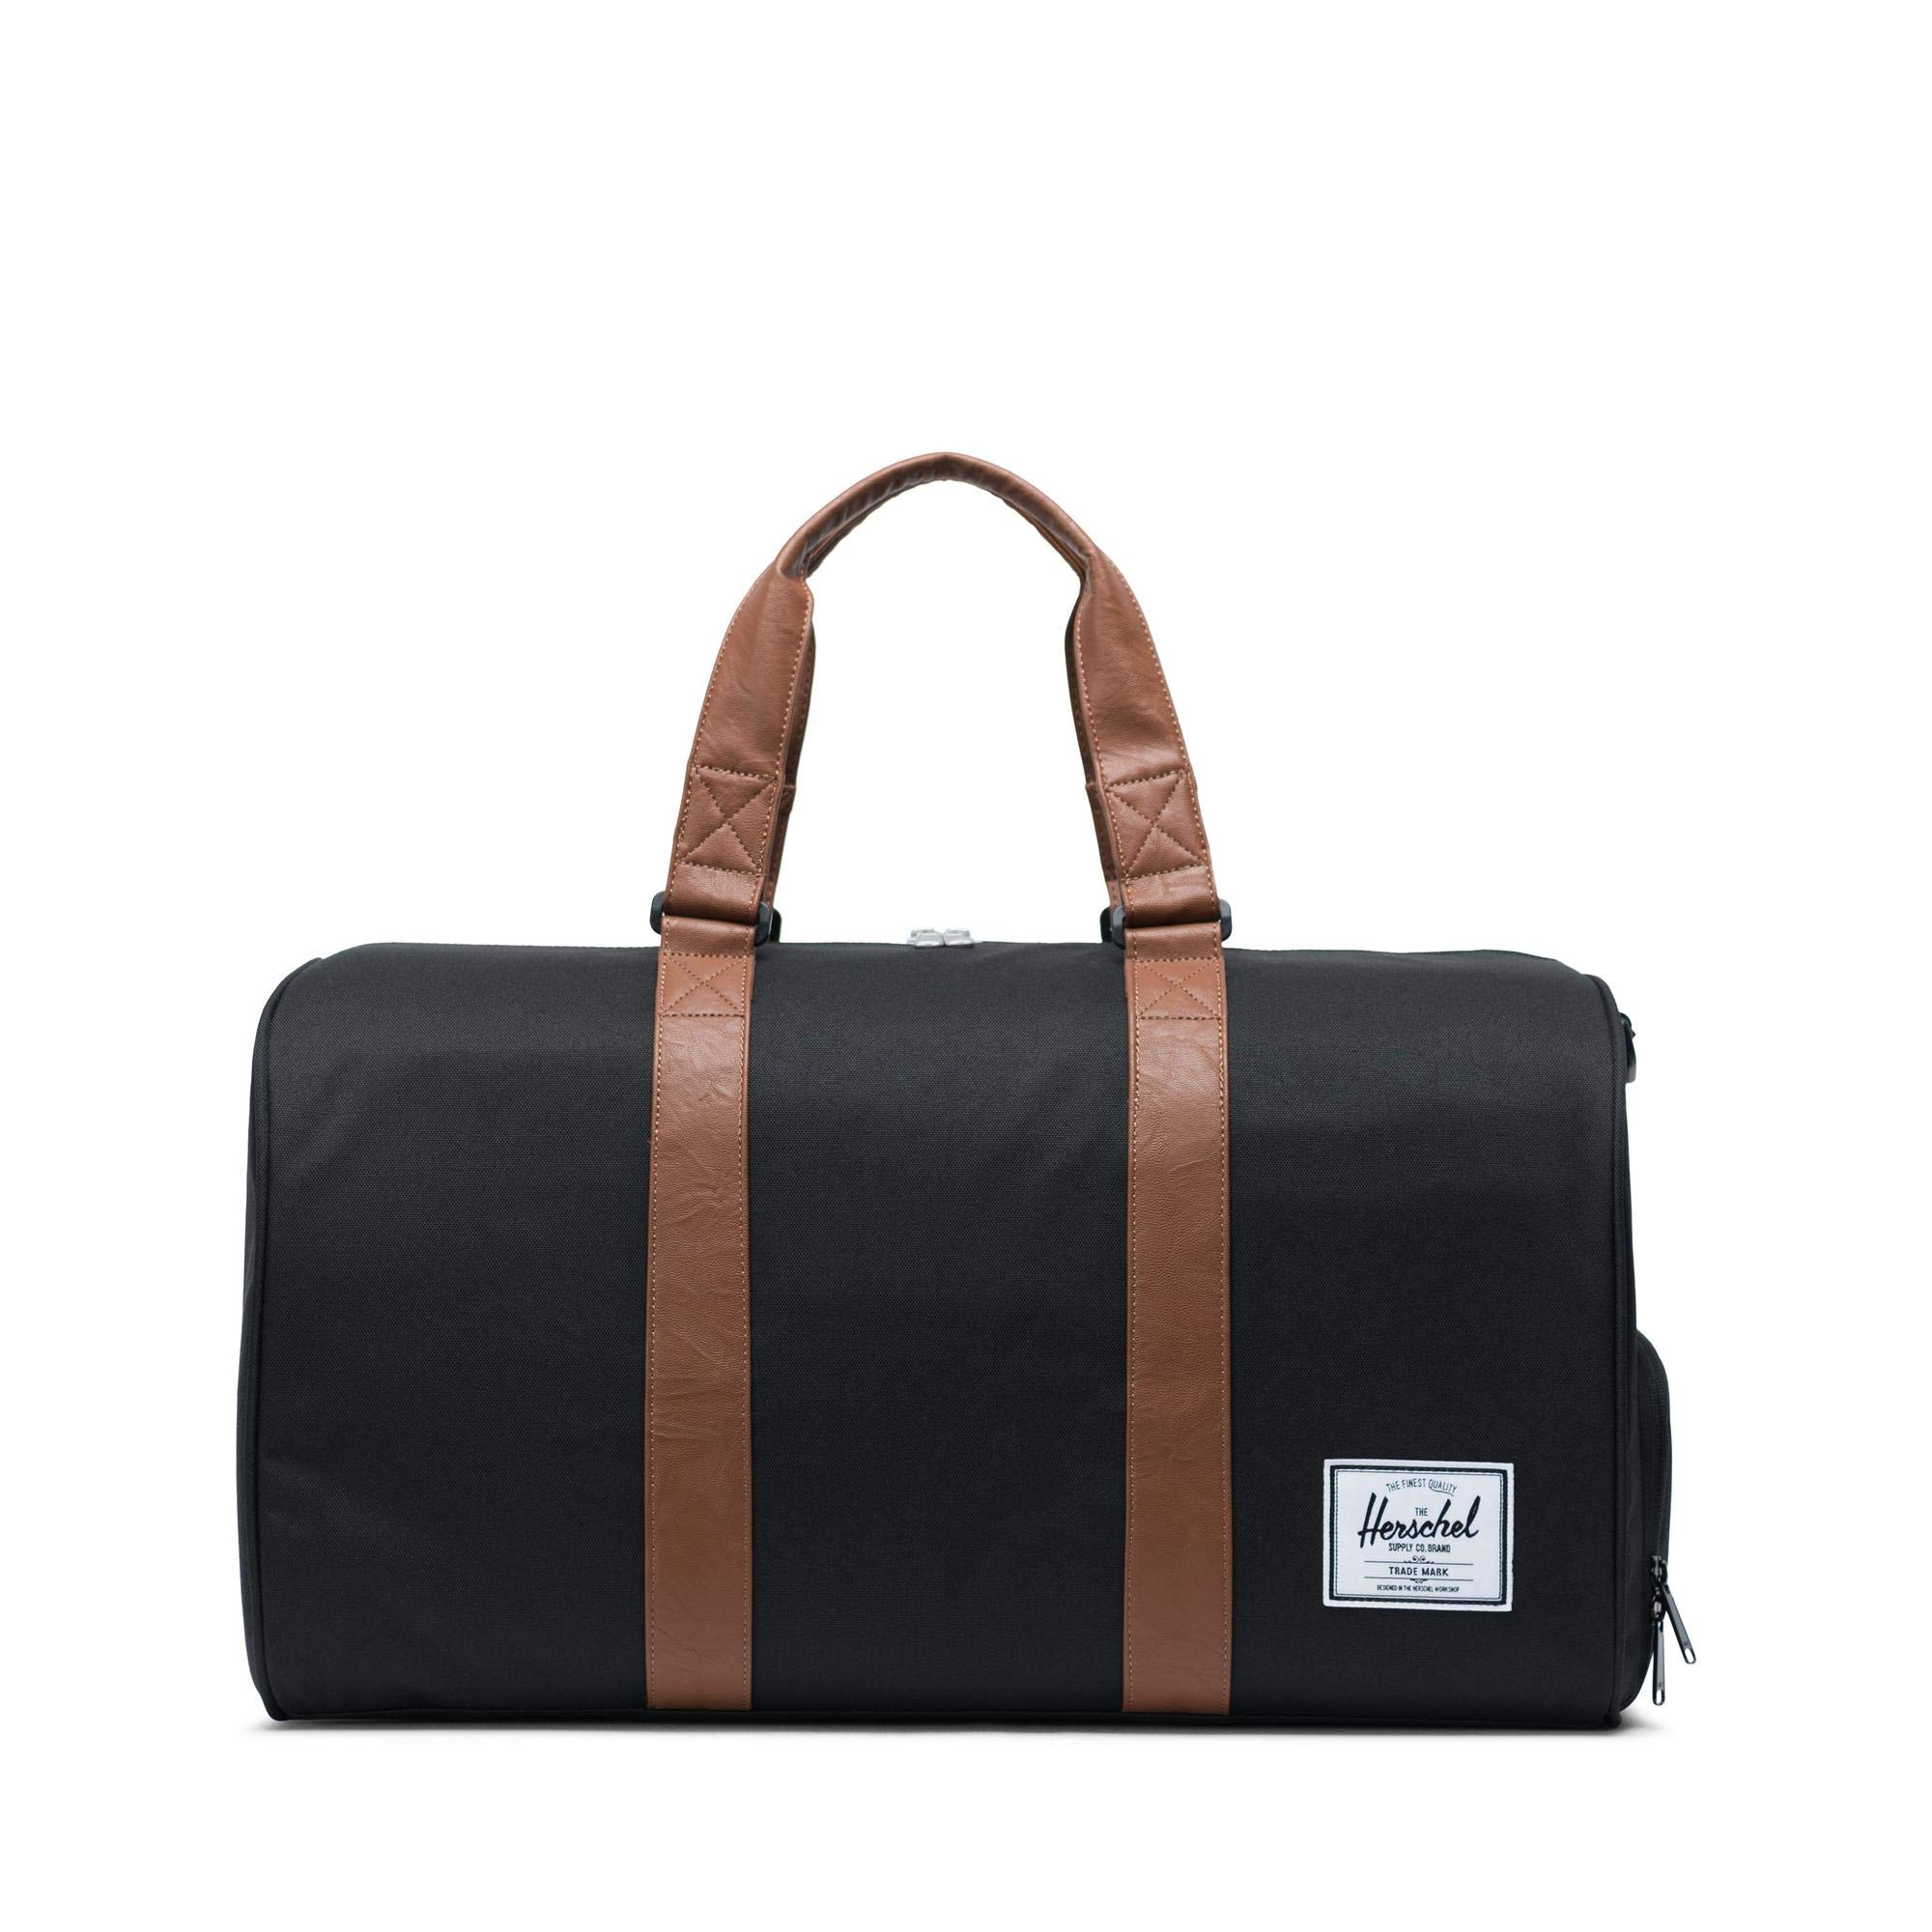 Herschel Novel Duffle Bag, Black, One Size by Herschel